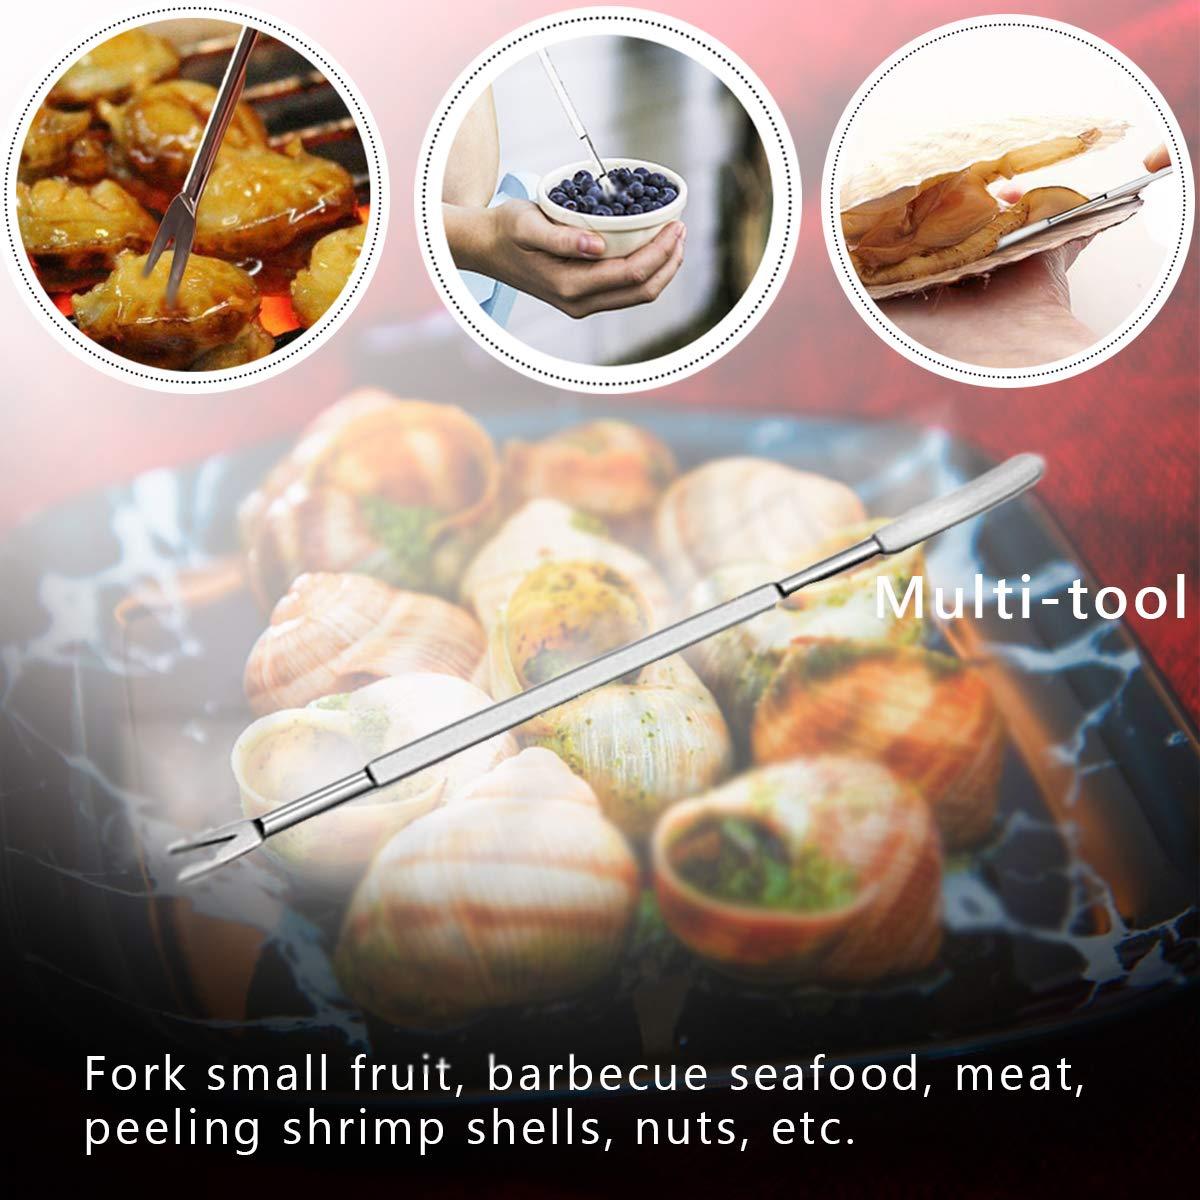 4 Crab Leg Forks//Picks 4 Lobster Sheller Knives 10 PCS Seafood Tools Crab Leg Crackers and Tools Including 2 Lobster Crab Crackers